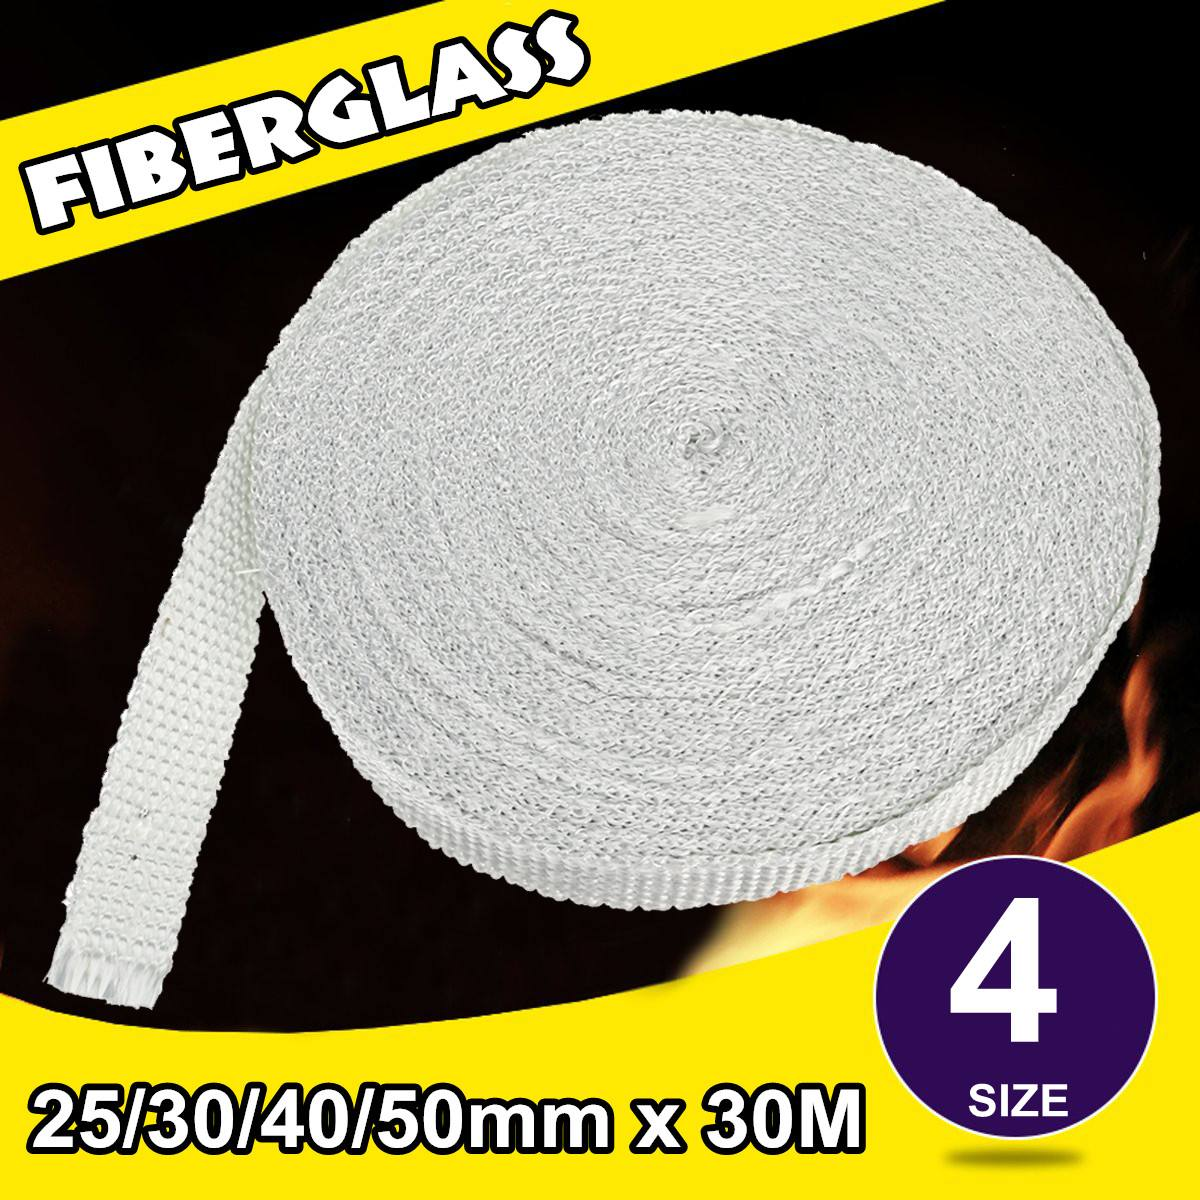 Grey Fiberglass Cloth Tape High strength Glass Fiber Fibrous Belt Resistant High Temperature Fiberglass Sealing Tape 4 Size